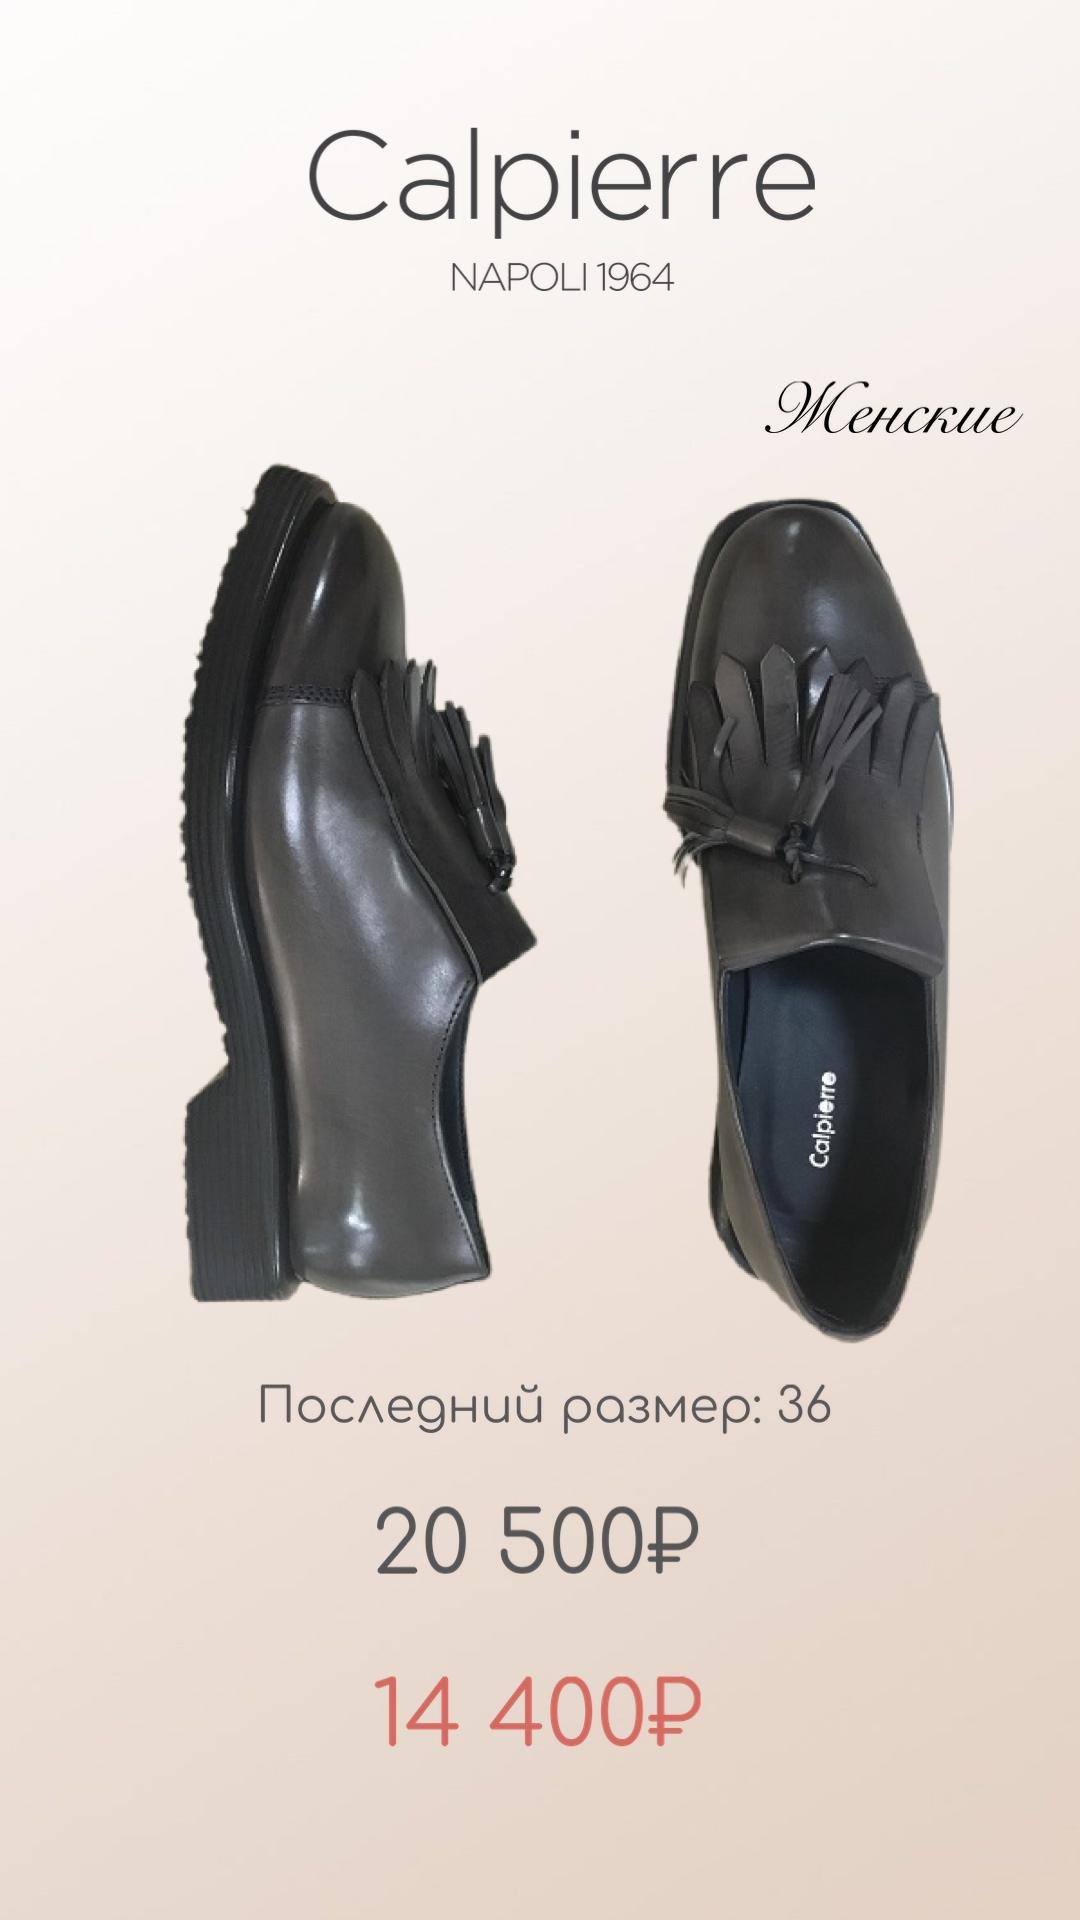 gallery_1_pust-ves-mir-budet-u-vashih-nog